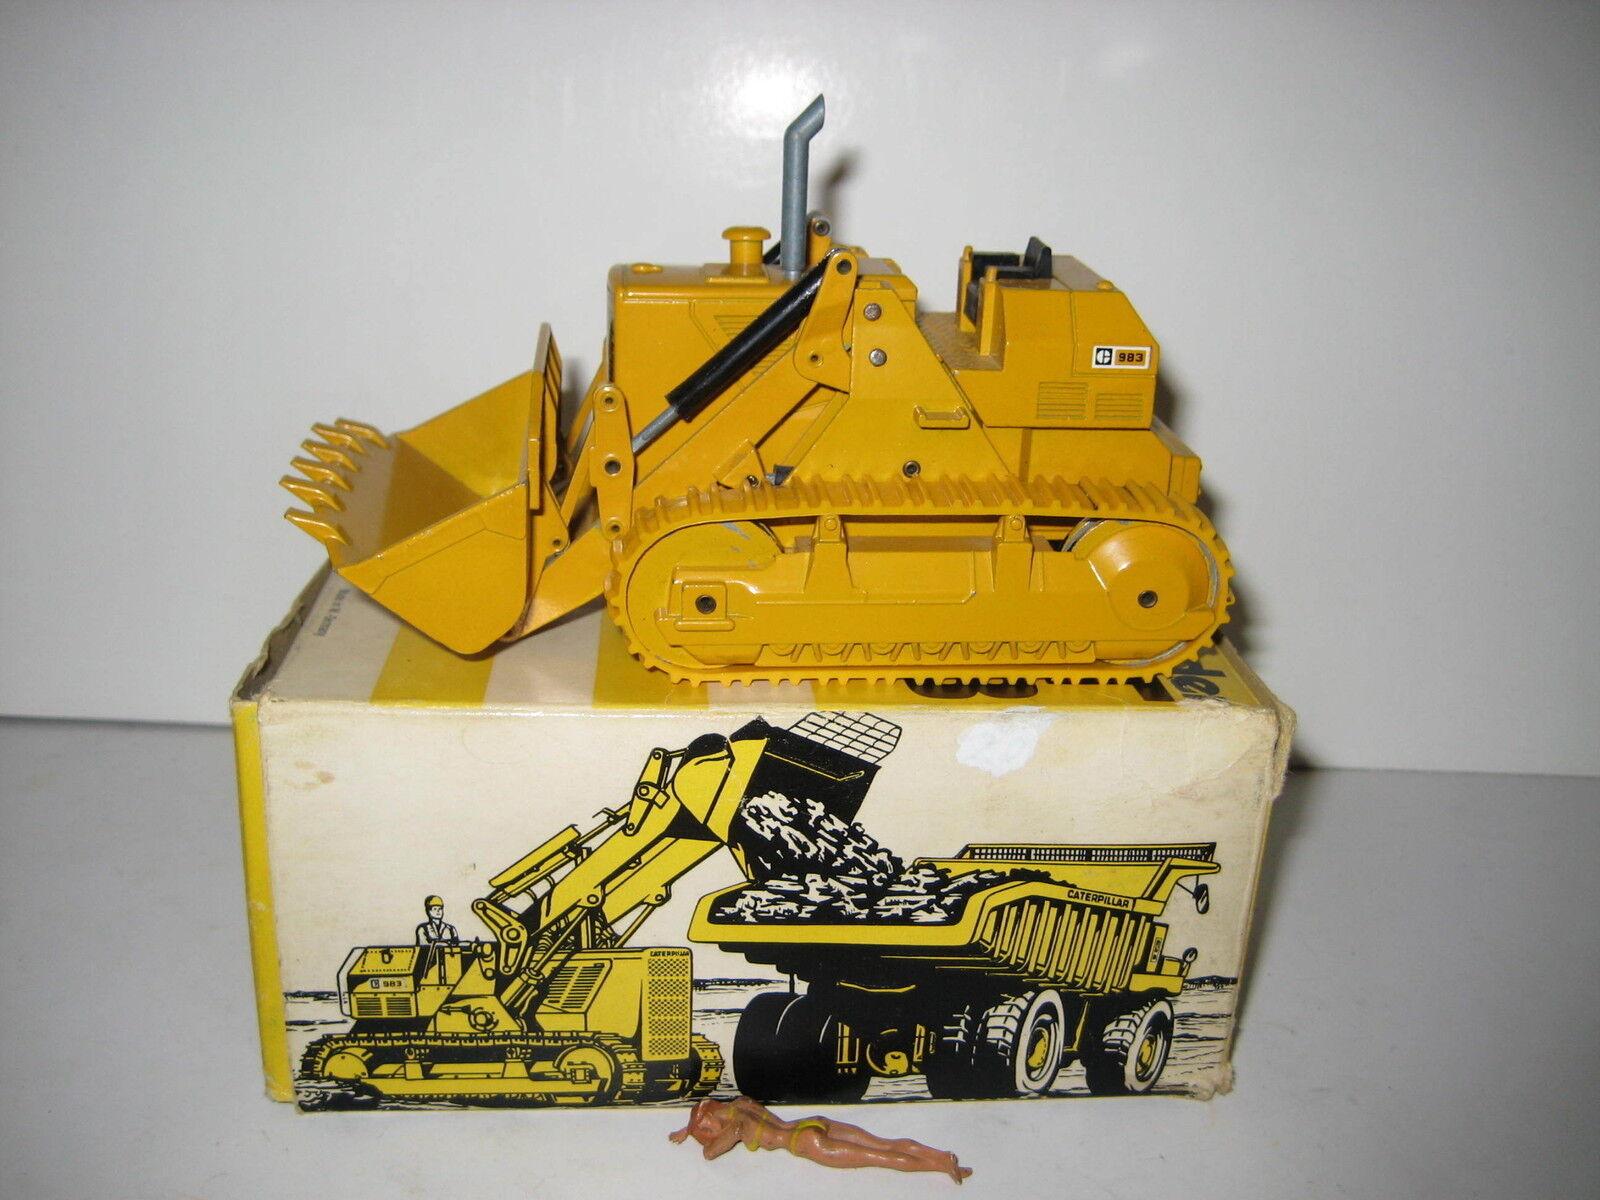 Caterpillar 983 Loader  140.2 Nzg 1 50 Boxed